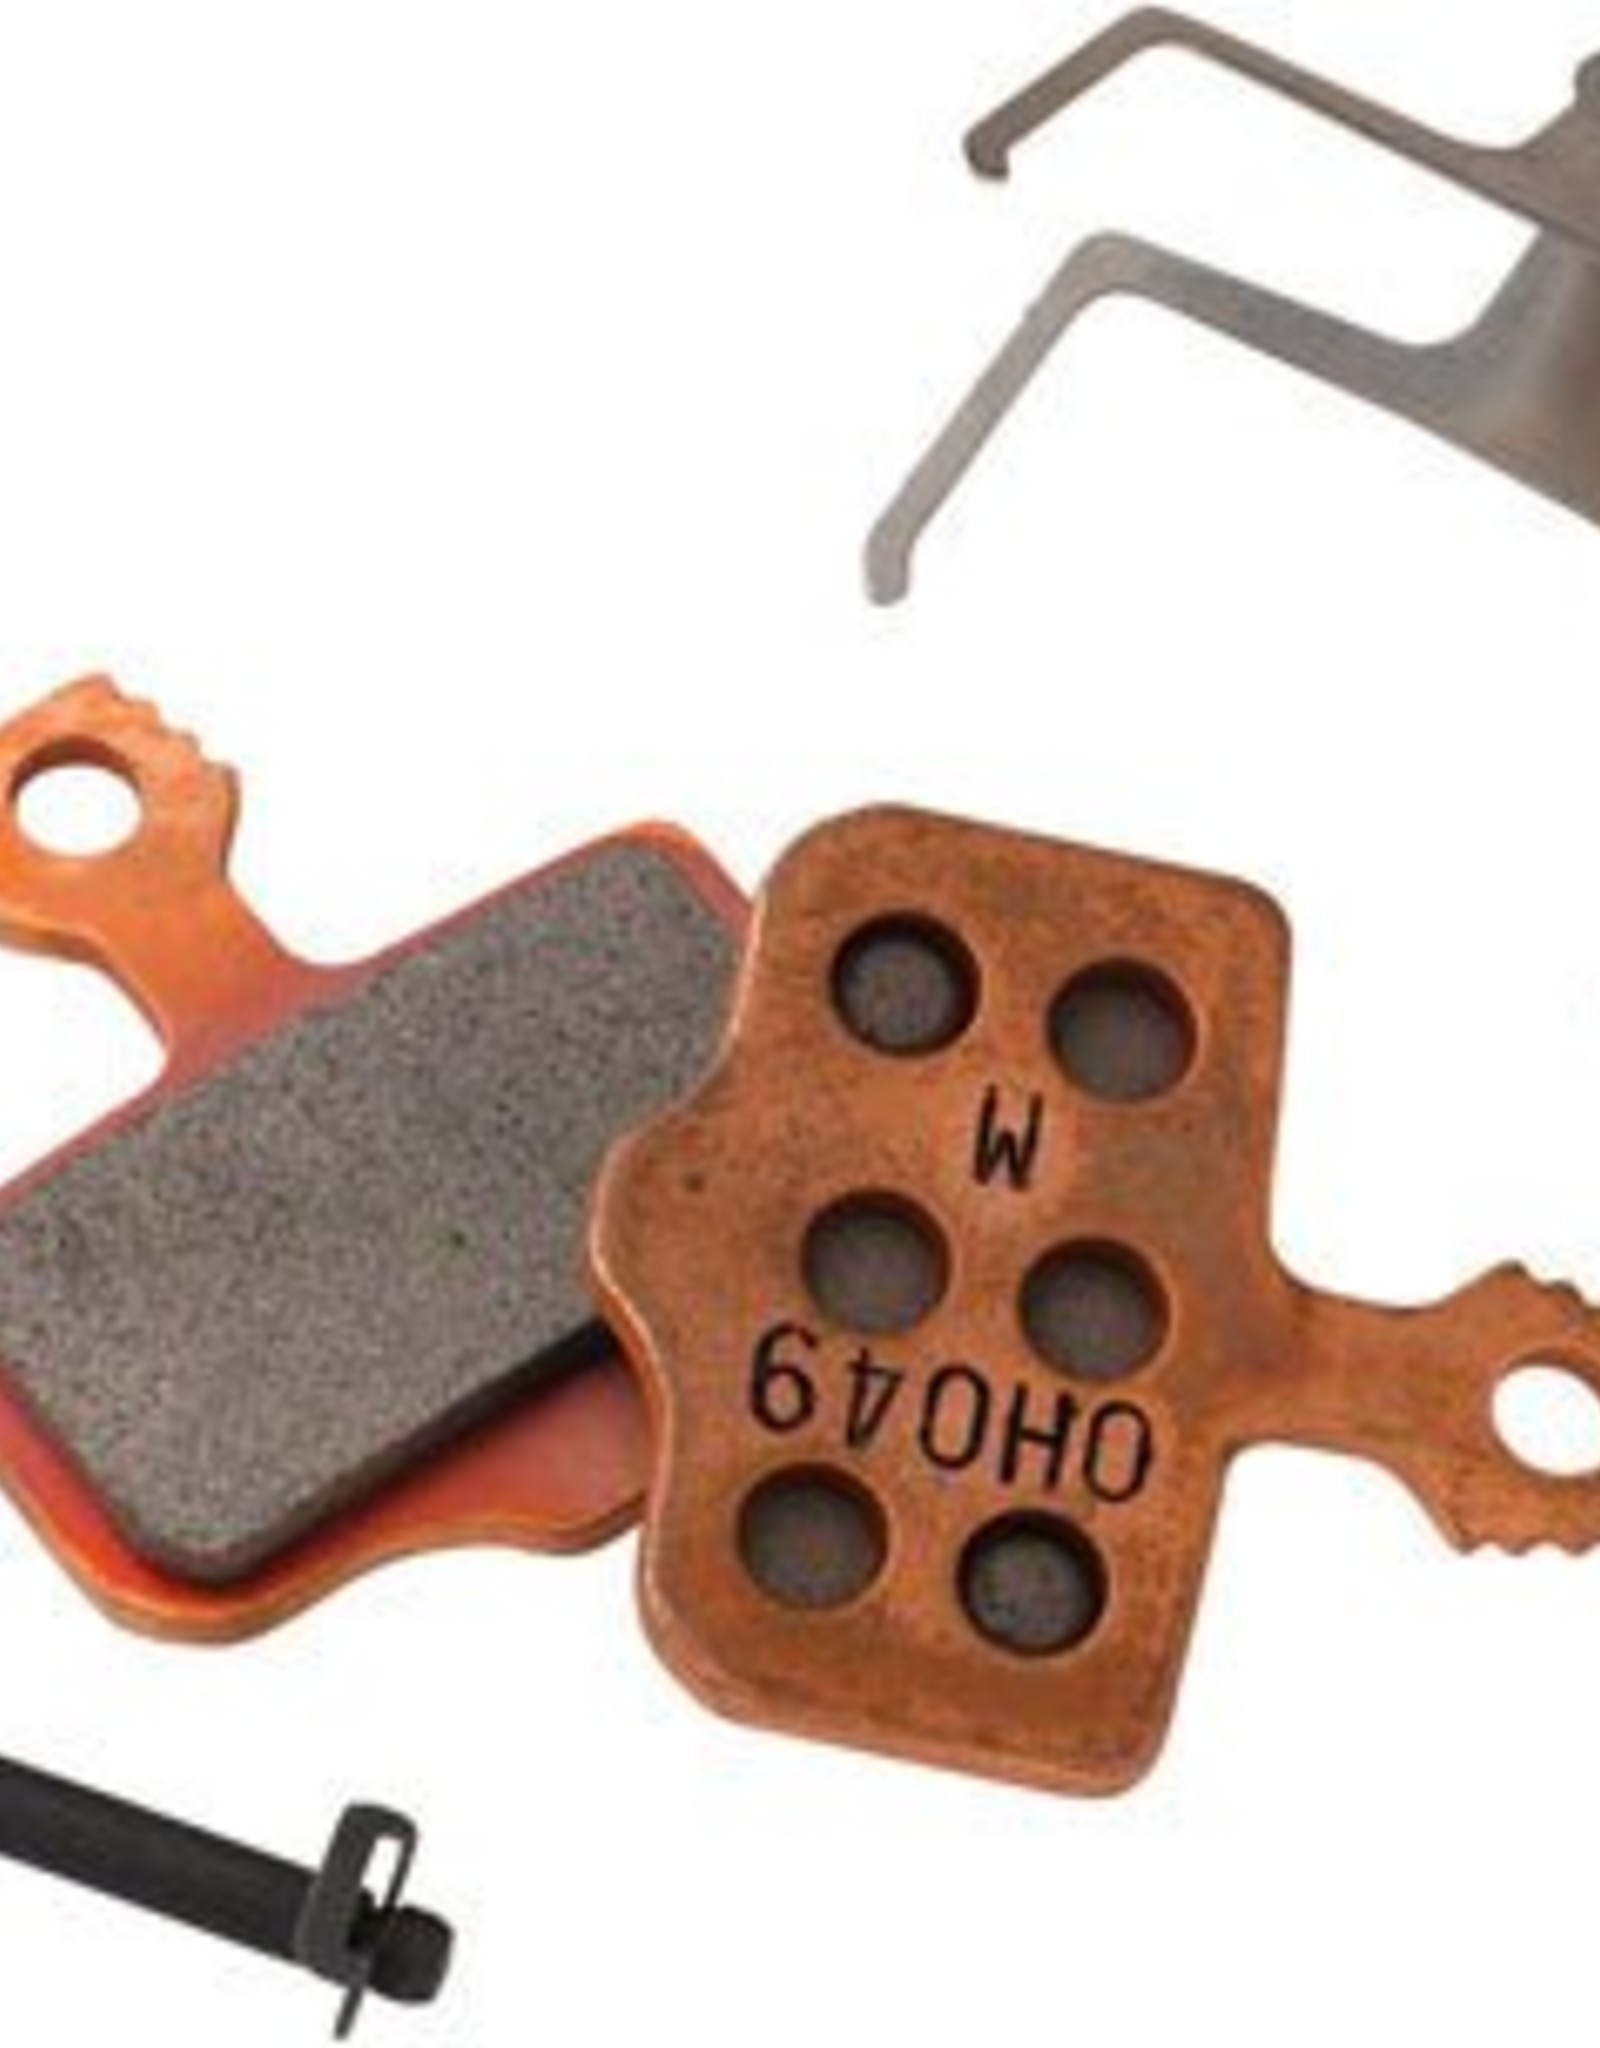 SRAM Elixir Steel Backed Metallic Disc Brake Pads